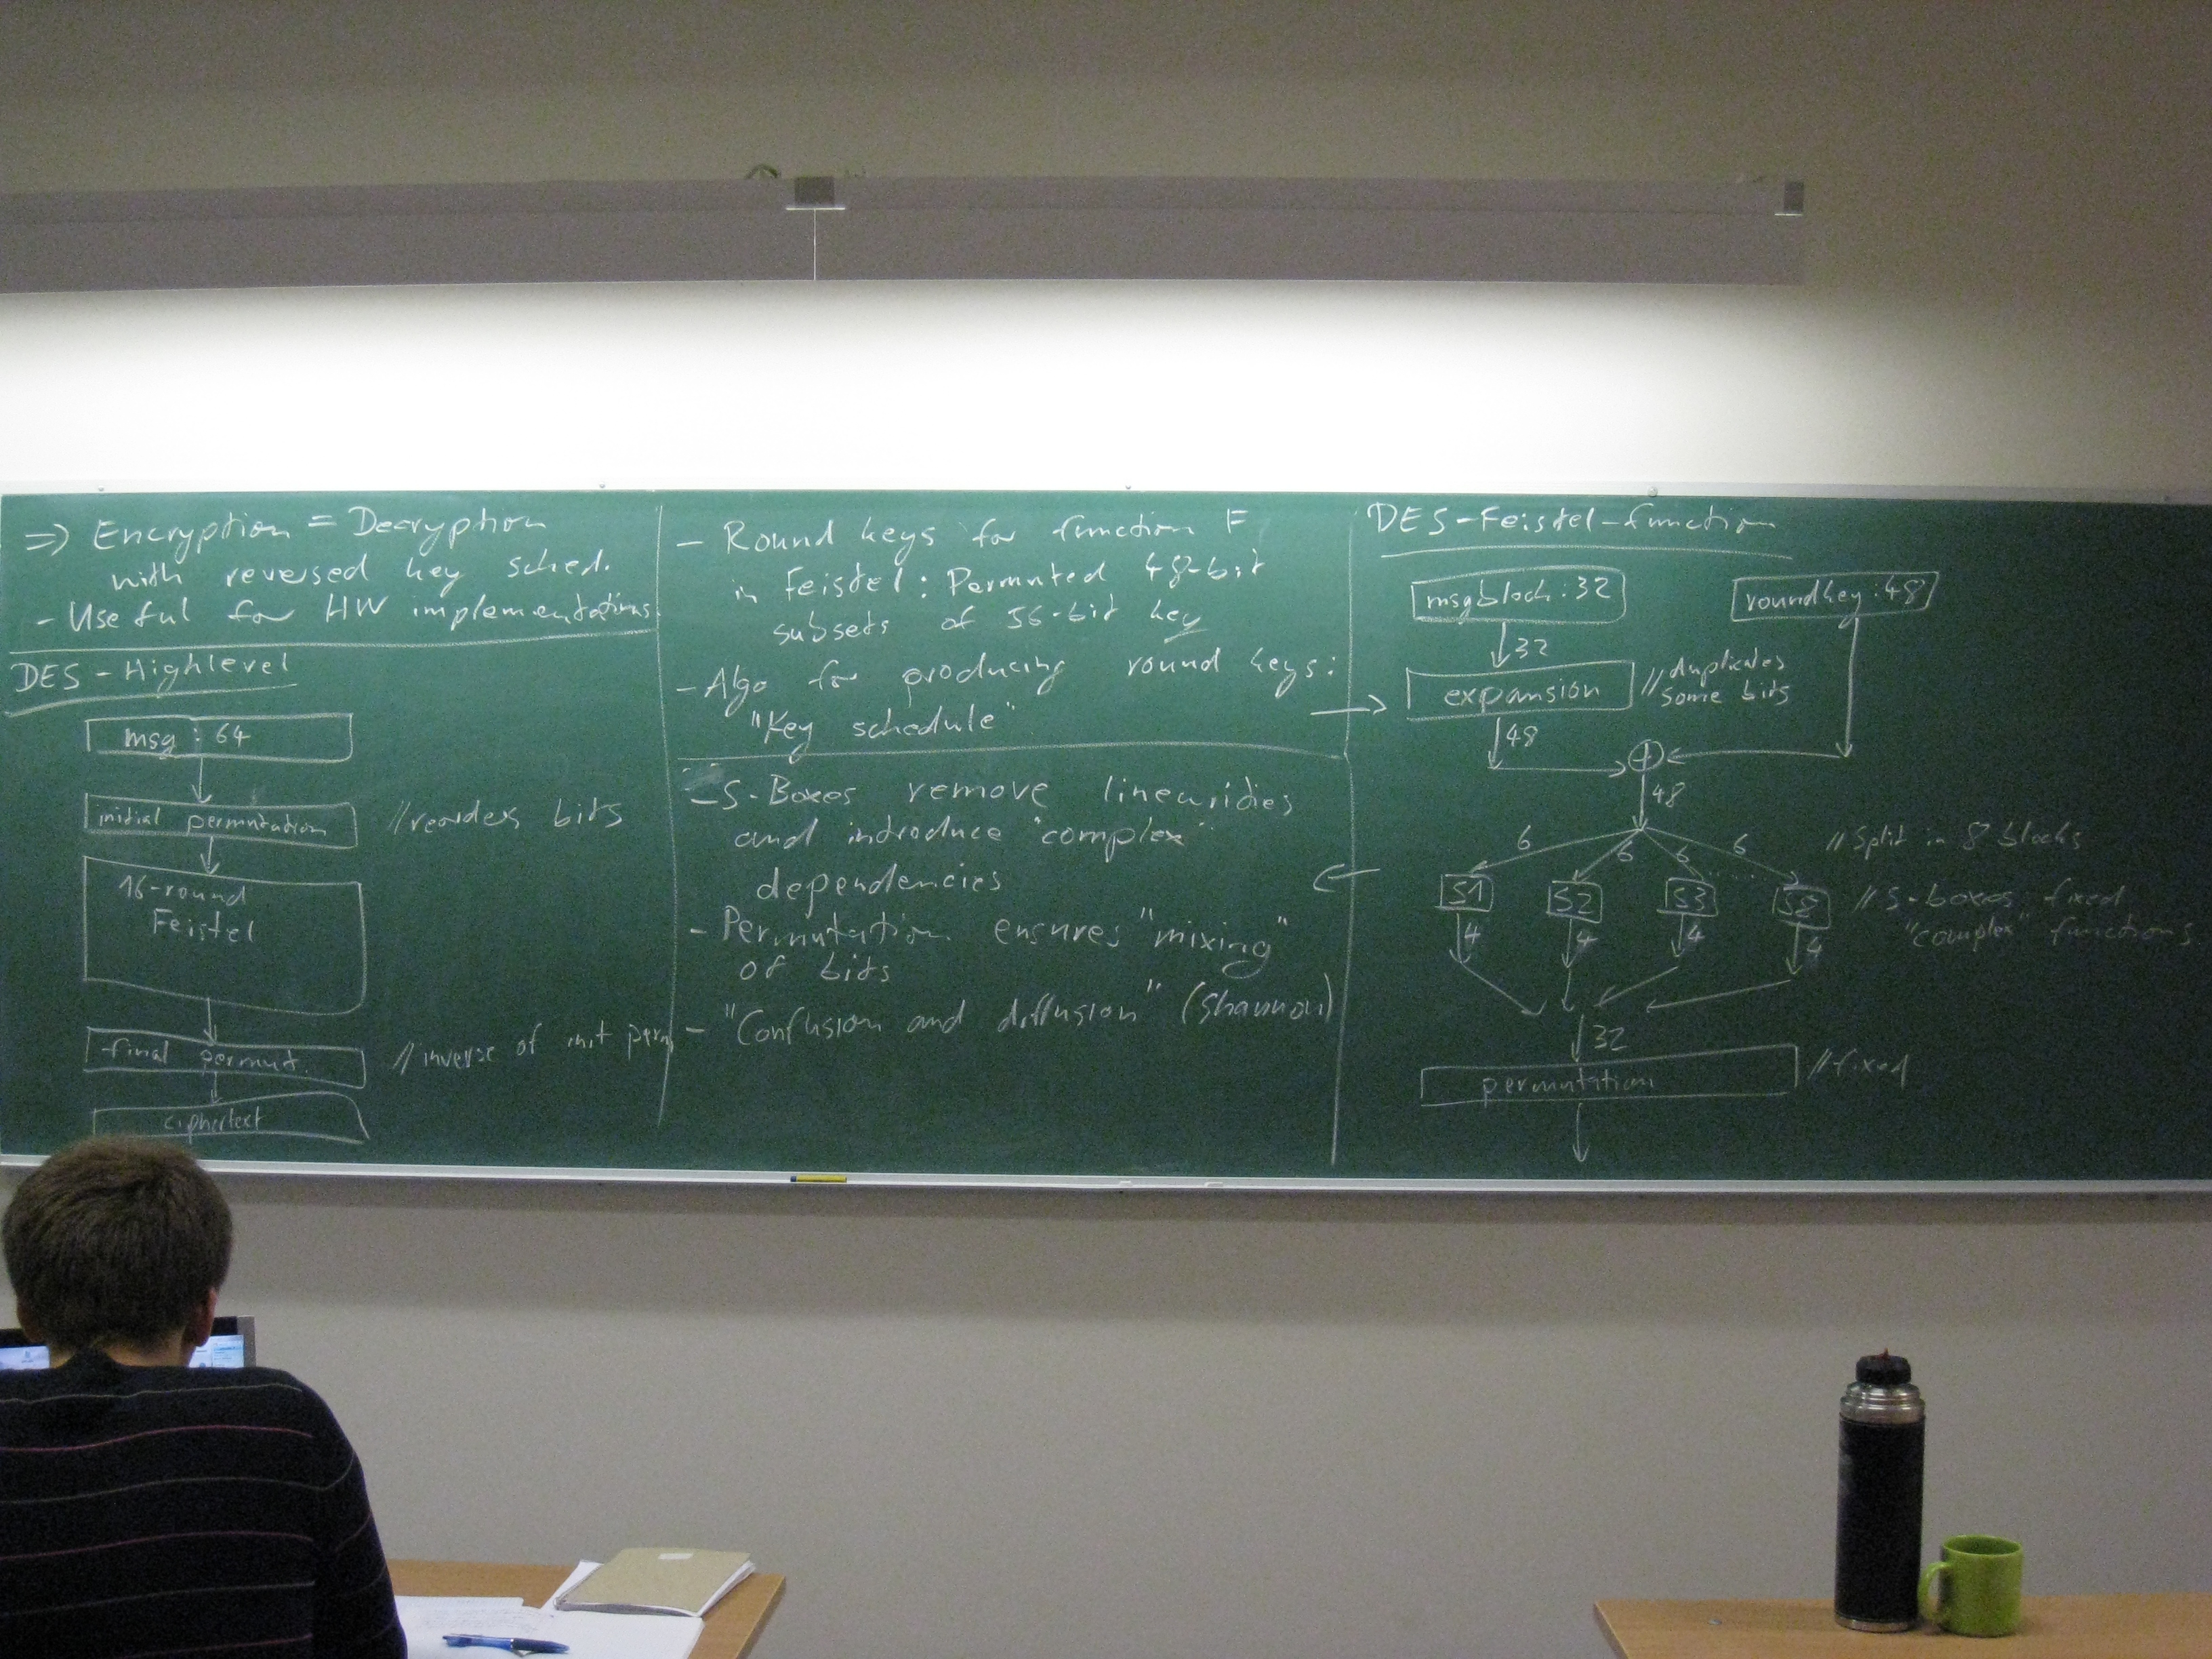 Quantum Cryptography - Black board photos - 2011-09-19_8900 jpg